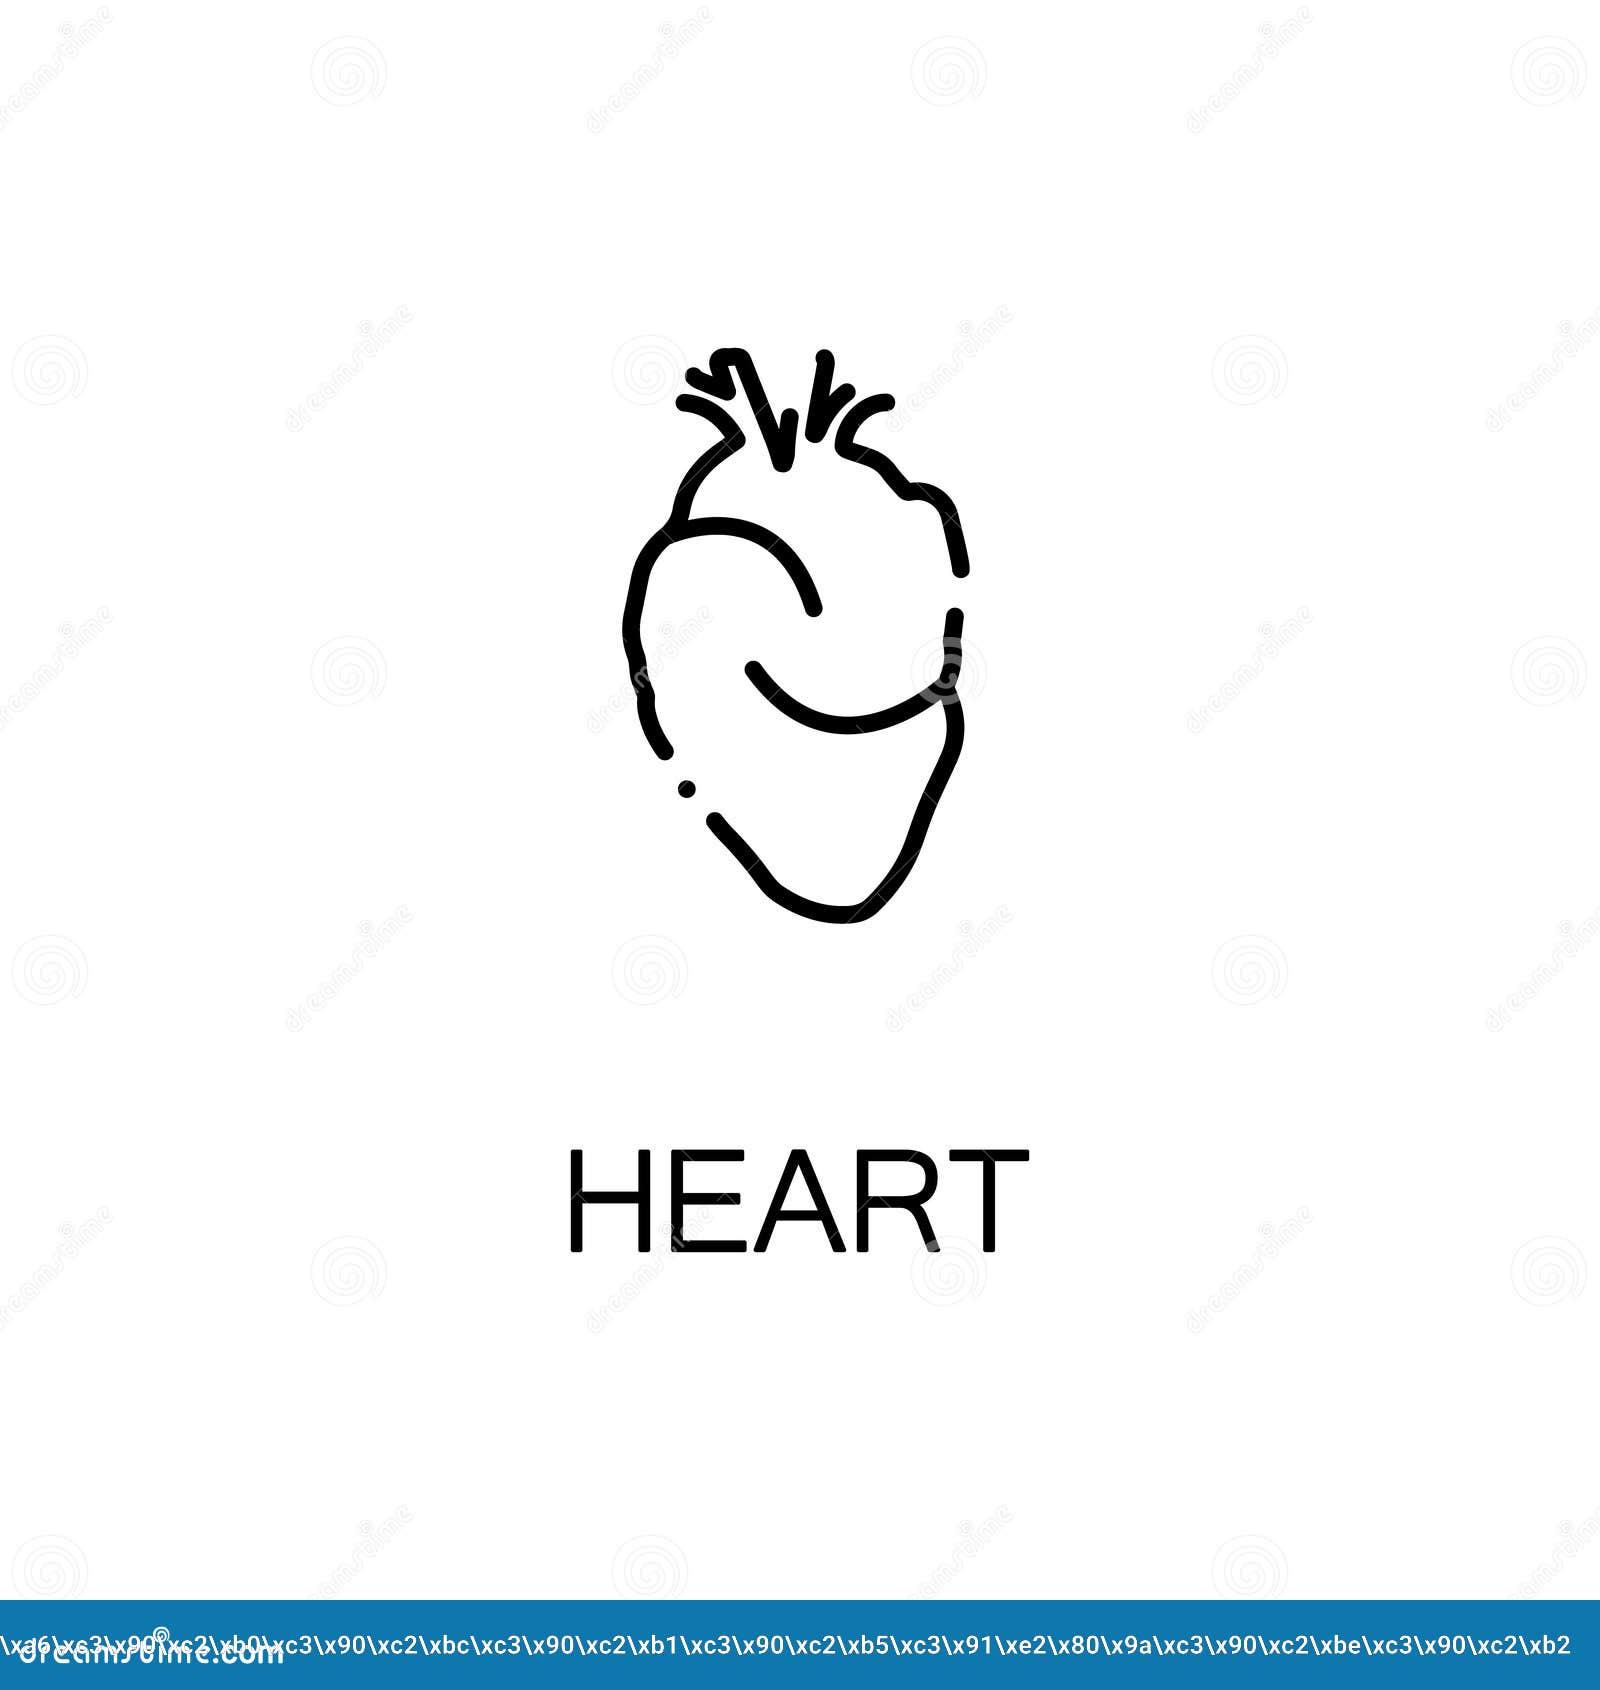 Human heart icon stock vector  Illustration of body, heart